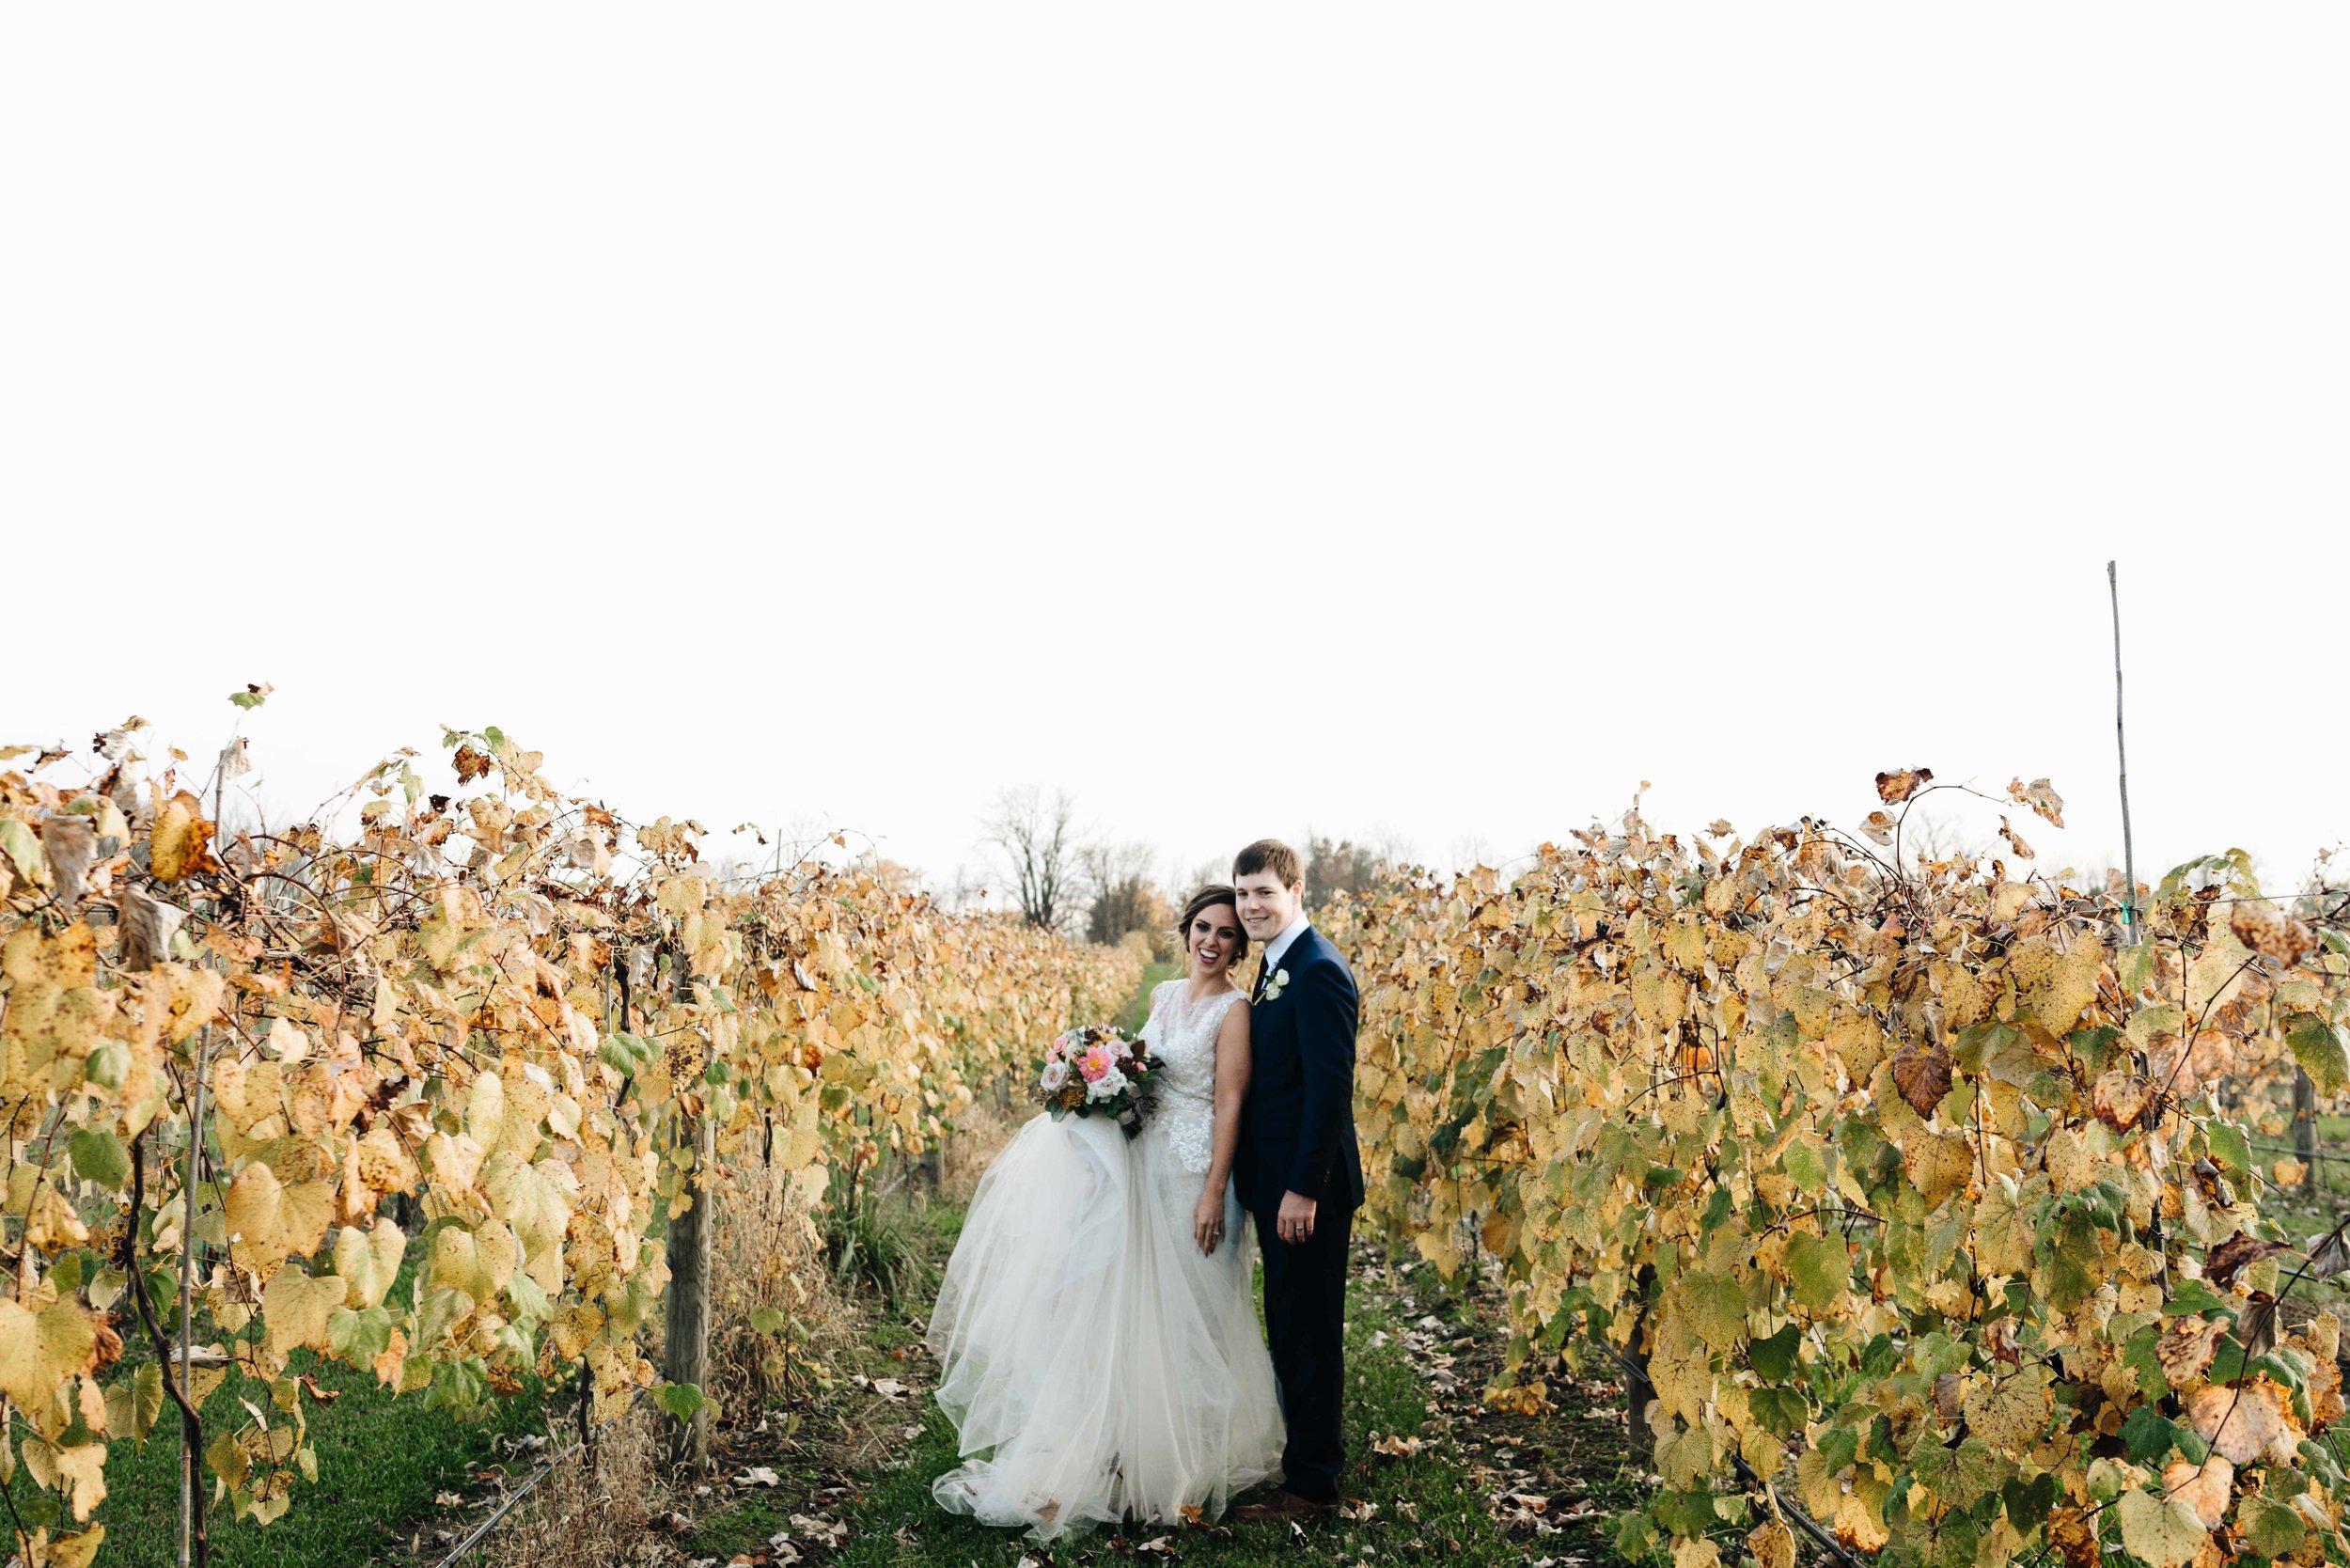 Carlee-Bob-Indianapolis-Wedding-Blog-76.jpg